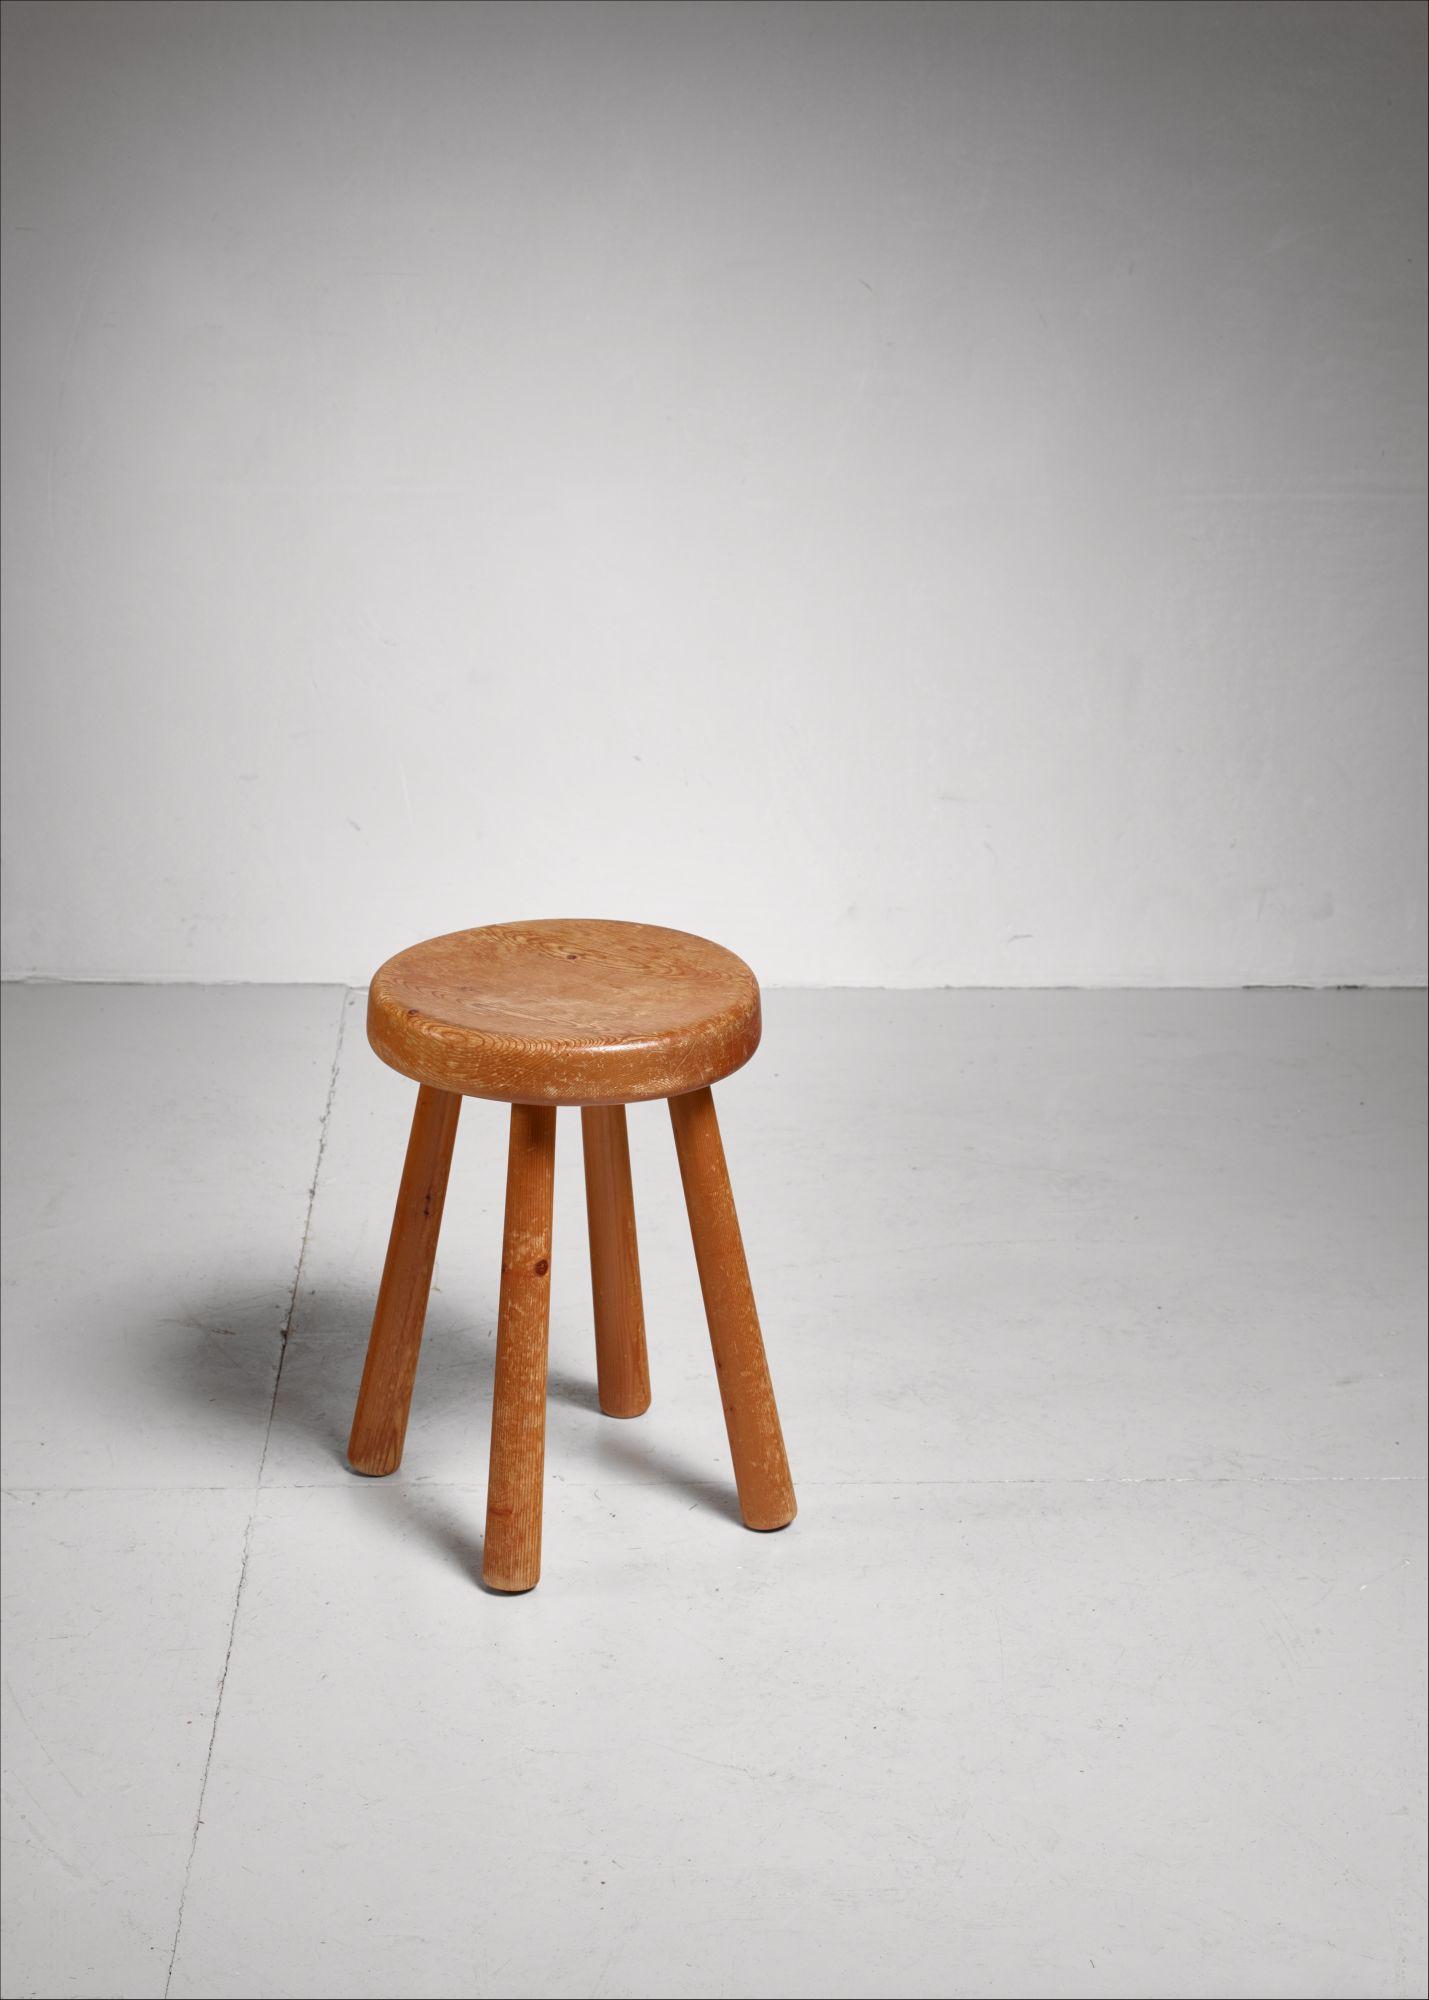 Fantastic Charlotte Perriand Four Legged Stool From Les Arcs France Ibusinesslaw Wood Chair Design Ideas Ibusinesslaworg